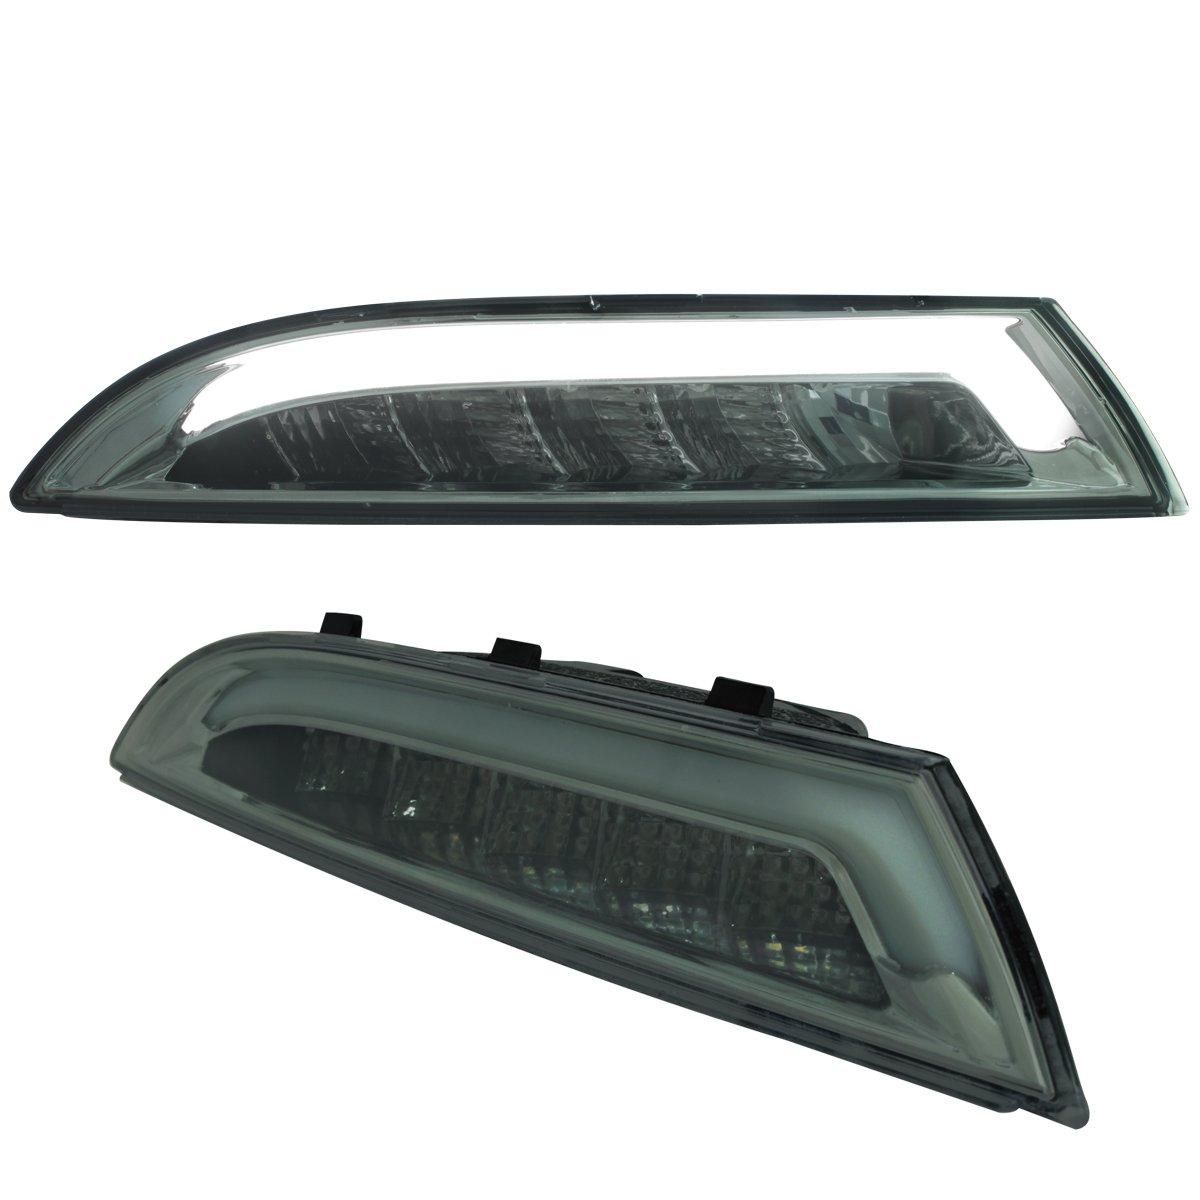 Dectane KGV08S LED Front Indicator Parking Light, Smoke